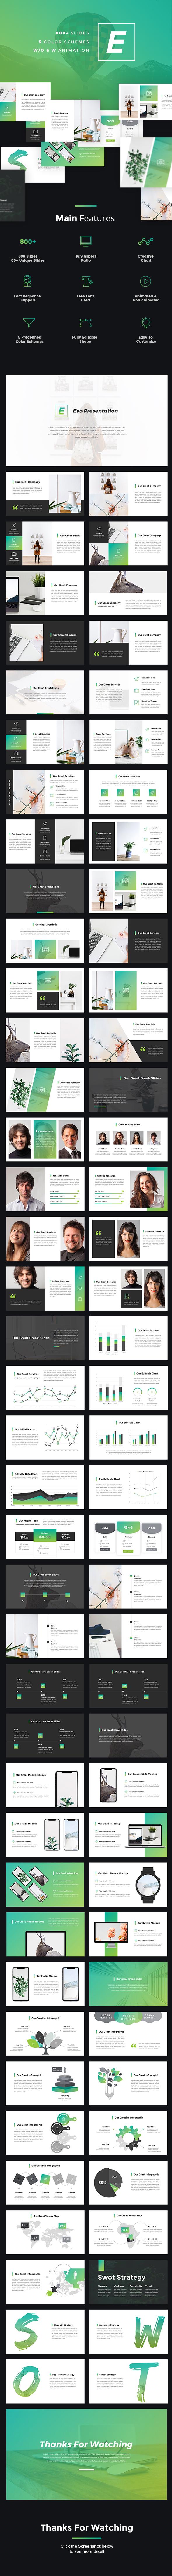 Evo - Creative PowerPoint Template - Creative PowerPoint Templates